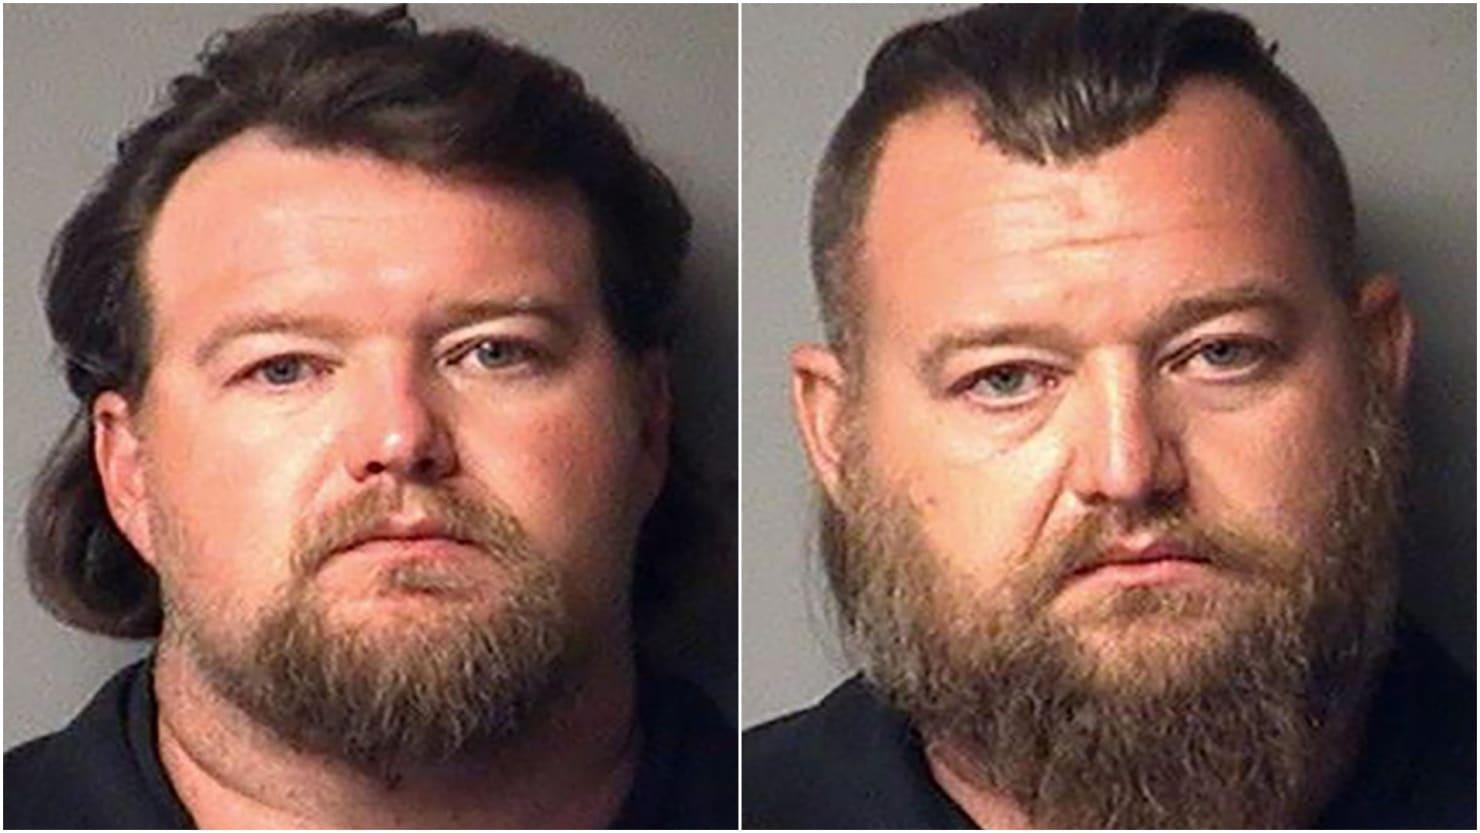 Sheriff Pal of Militia Twins: Whitmer Kidnap Plot Could've Been a Legal 'Citizen's Arrest' Attempt